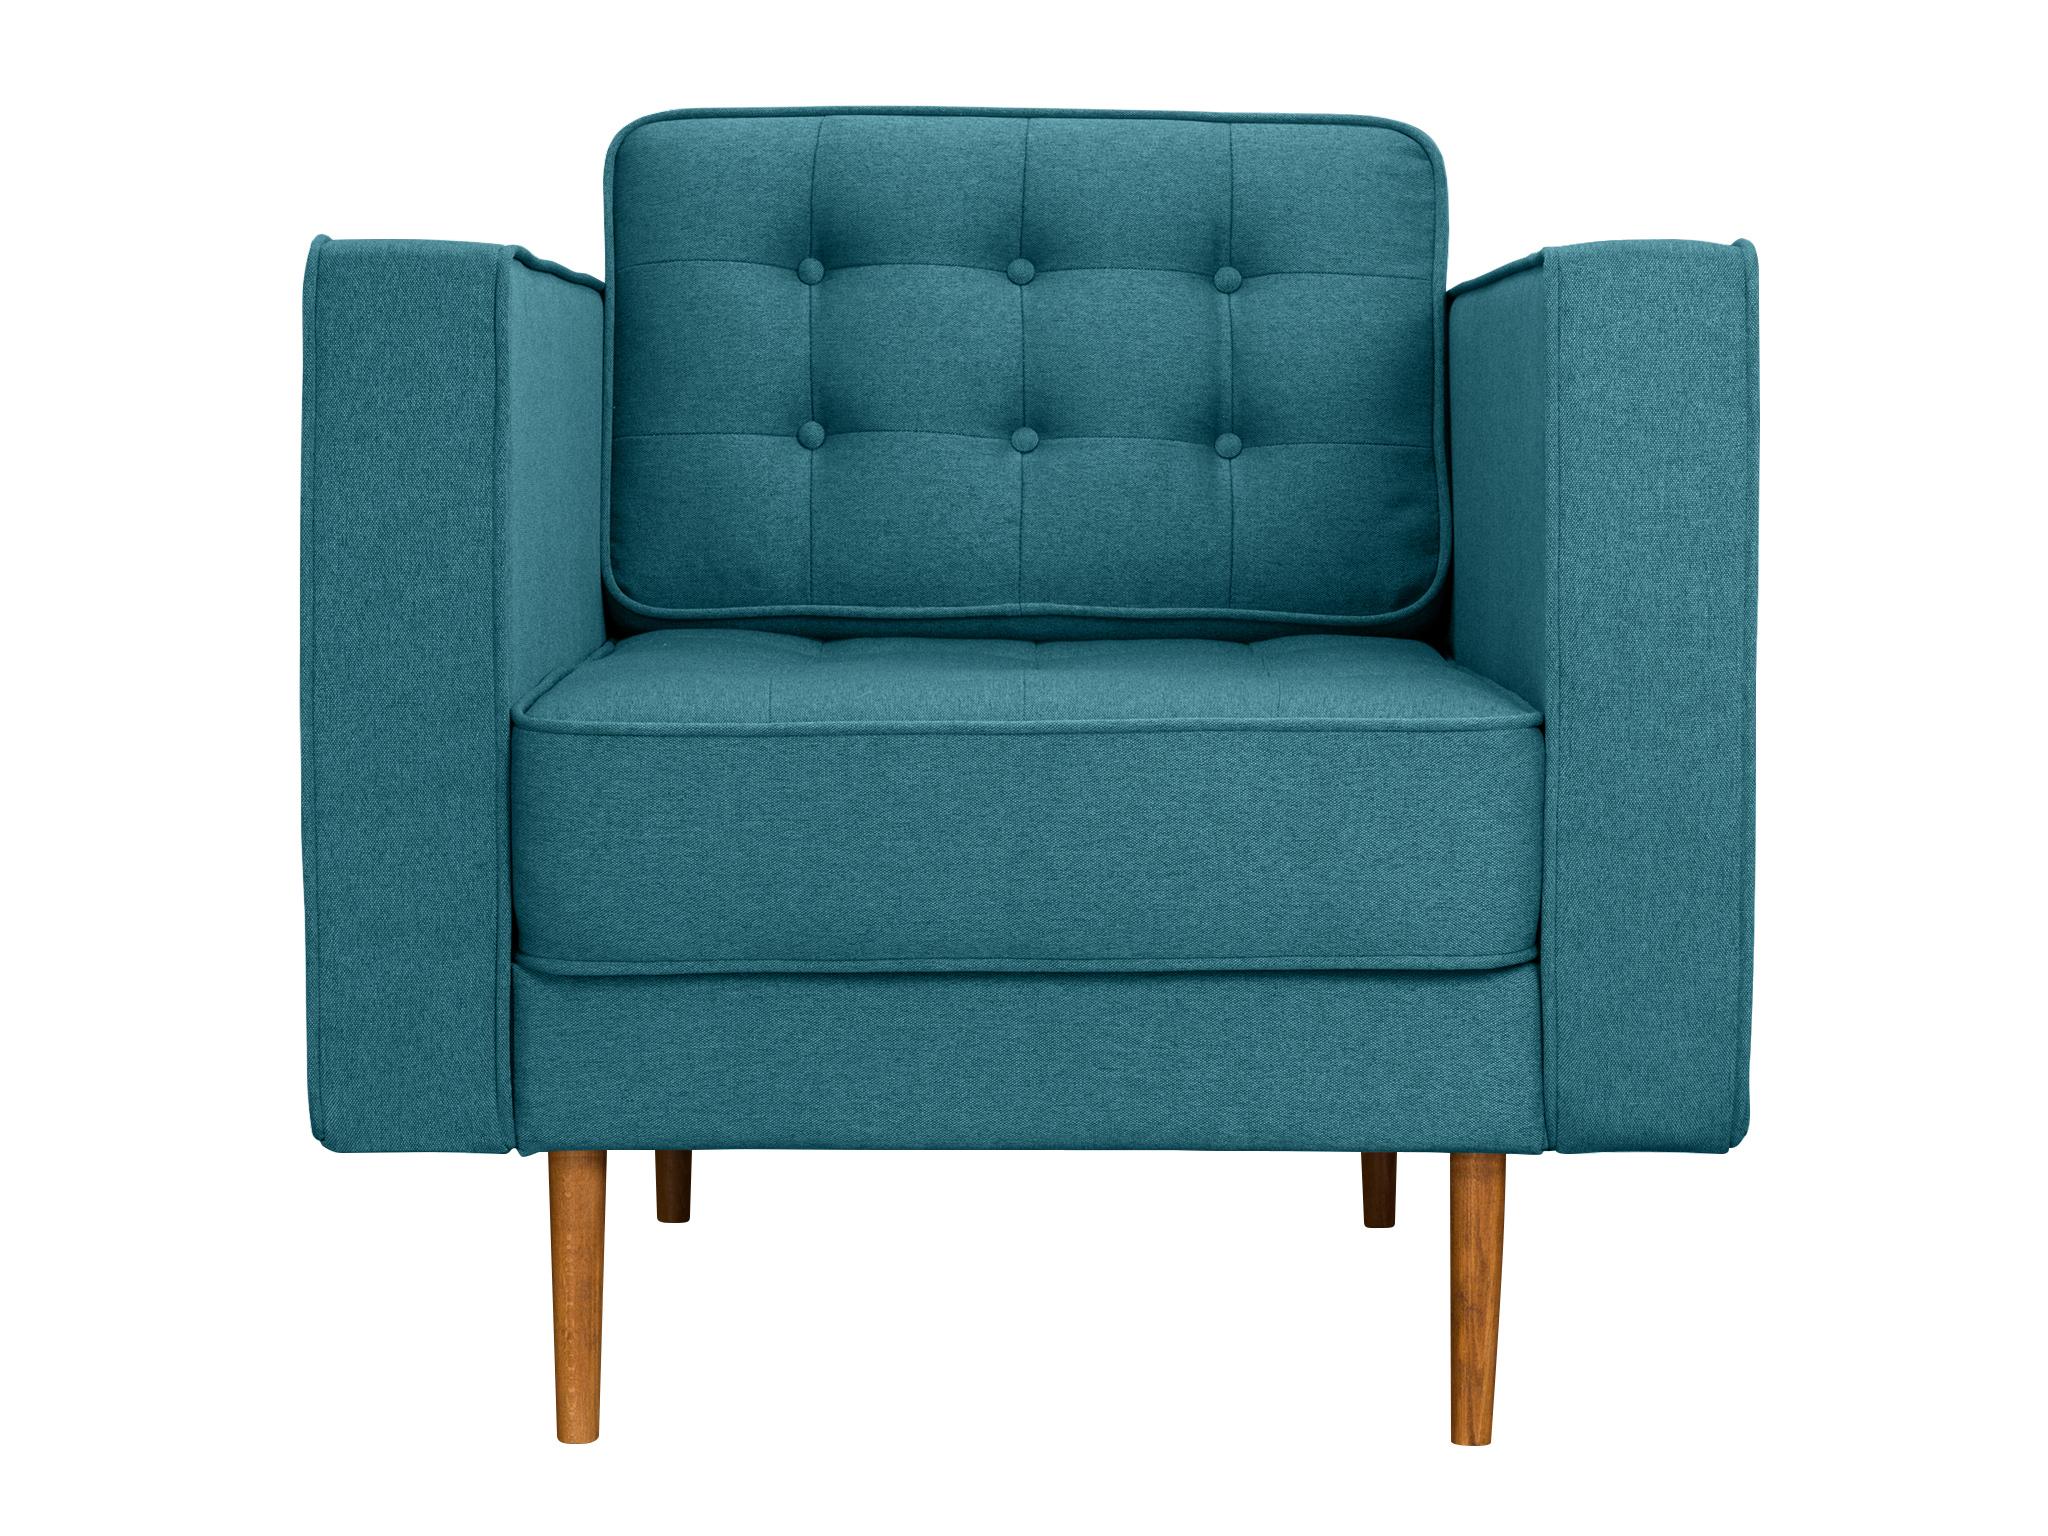 Кресло MyFurnish 15435641 от thefurnish